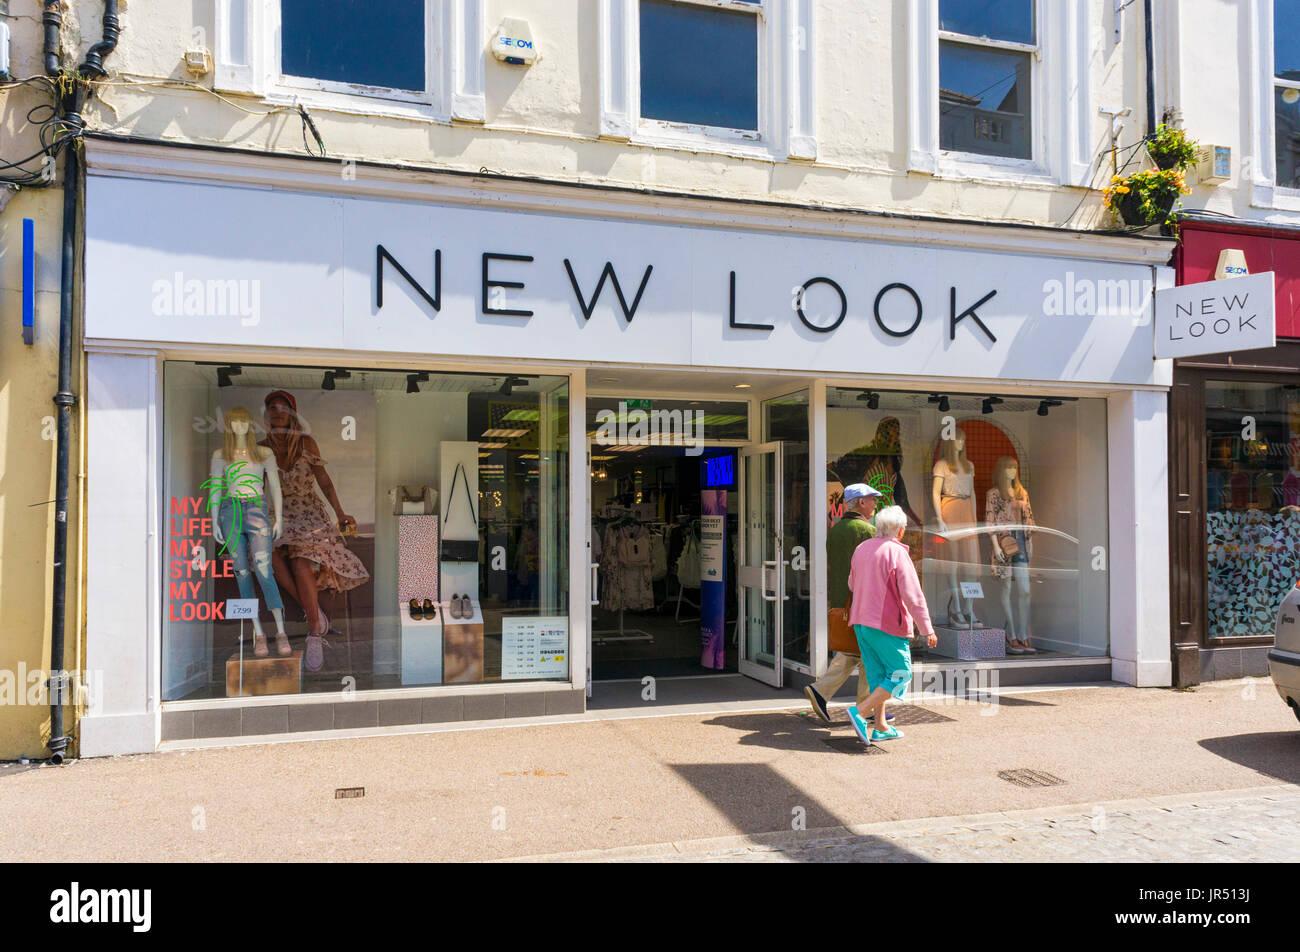 New Look clothing store, England, UKStock Photo